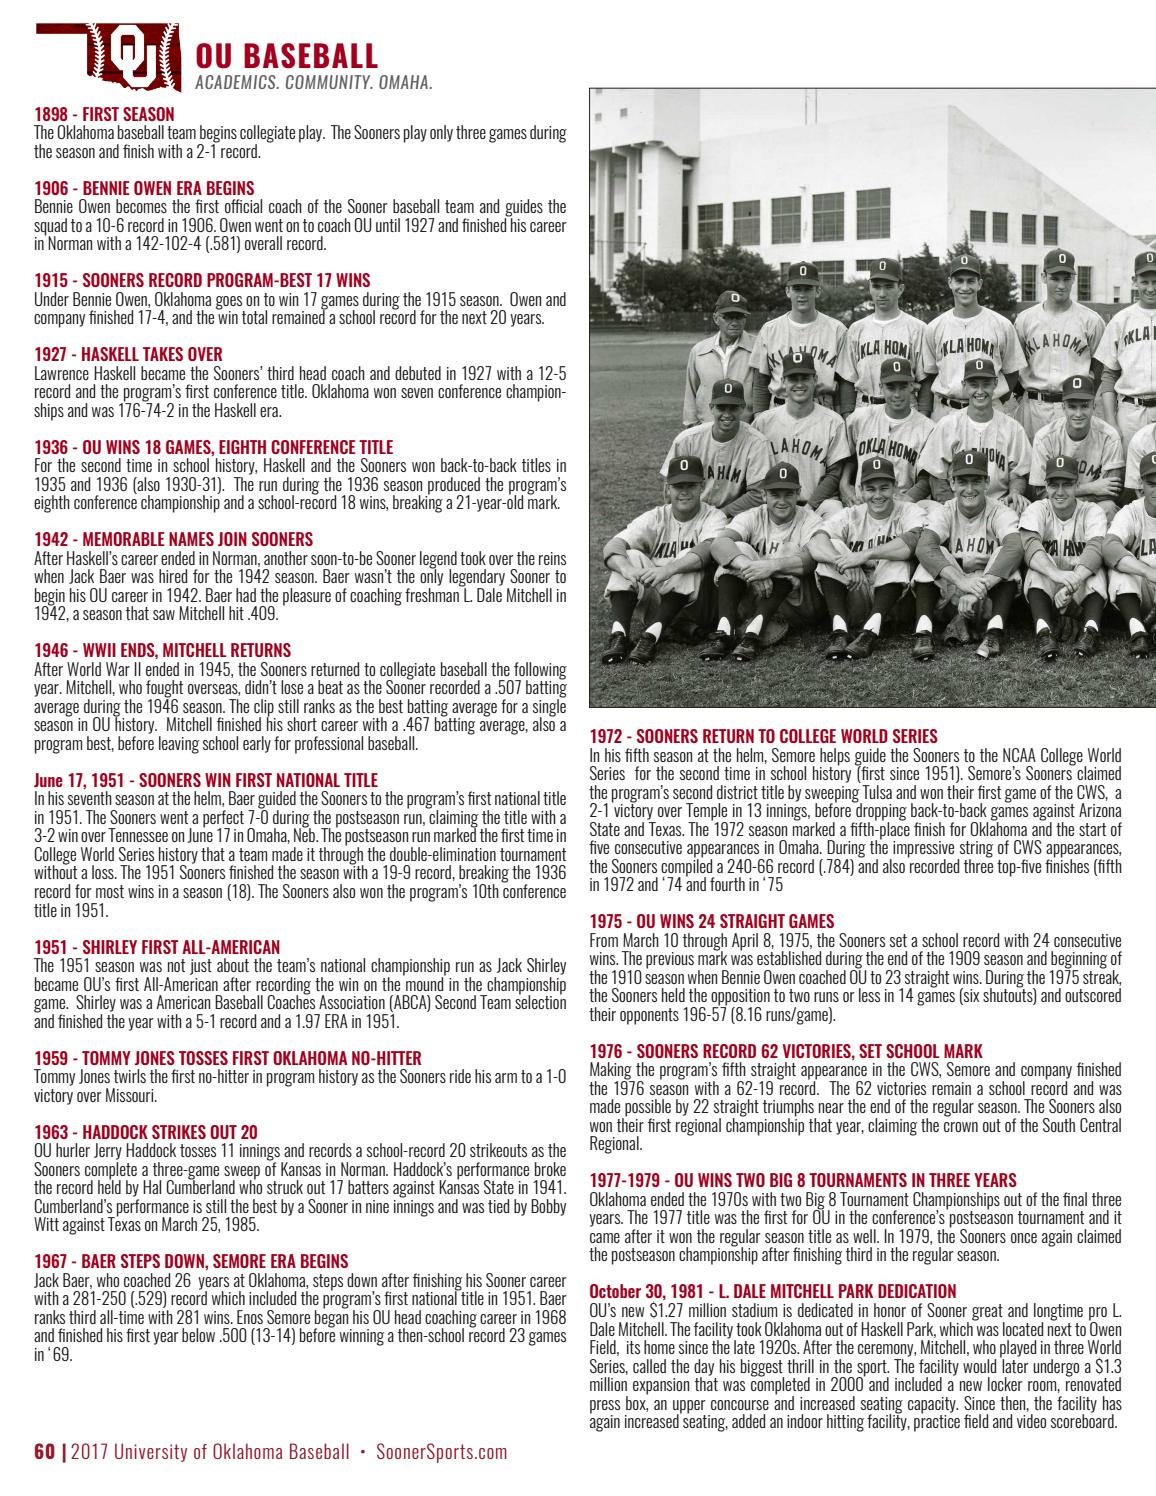 2017 Oklahoma Baseball Media Guide By Ou Athletics Issuu